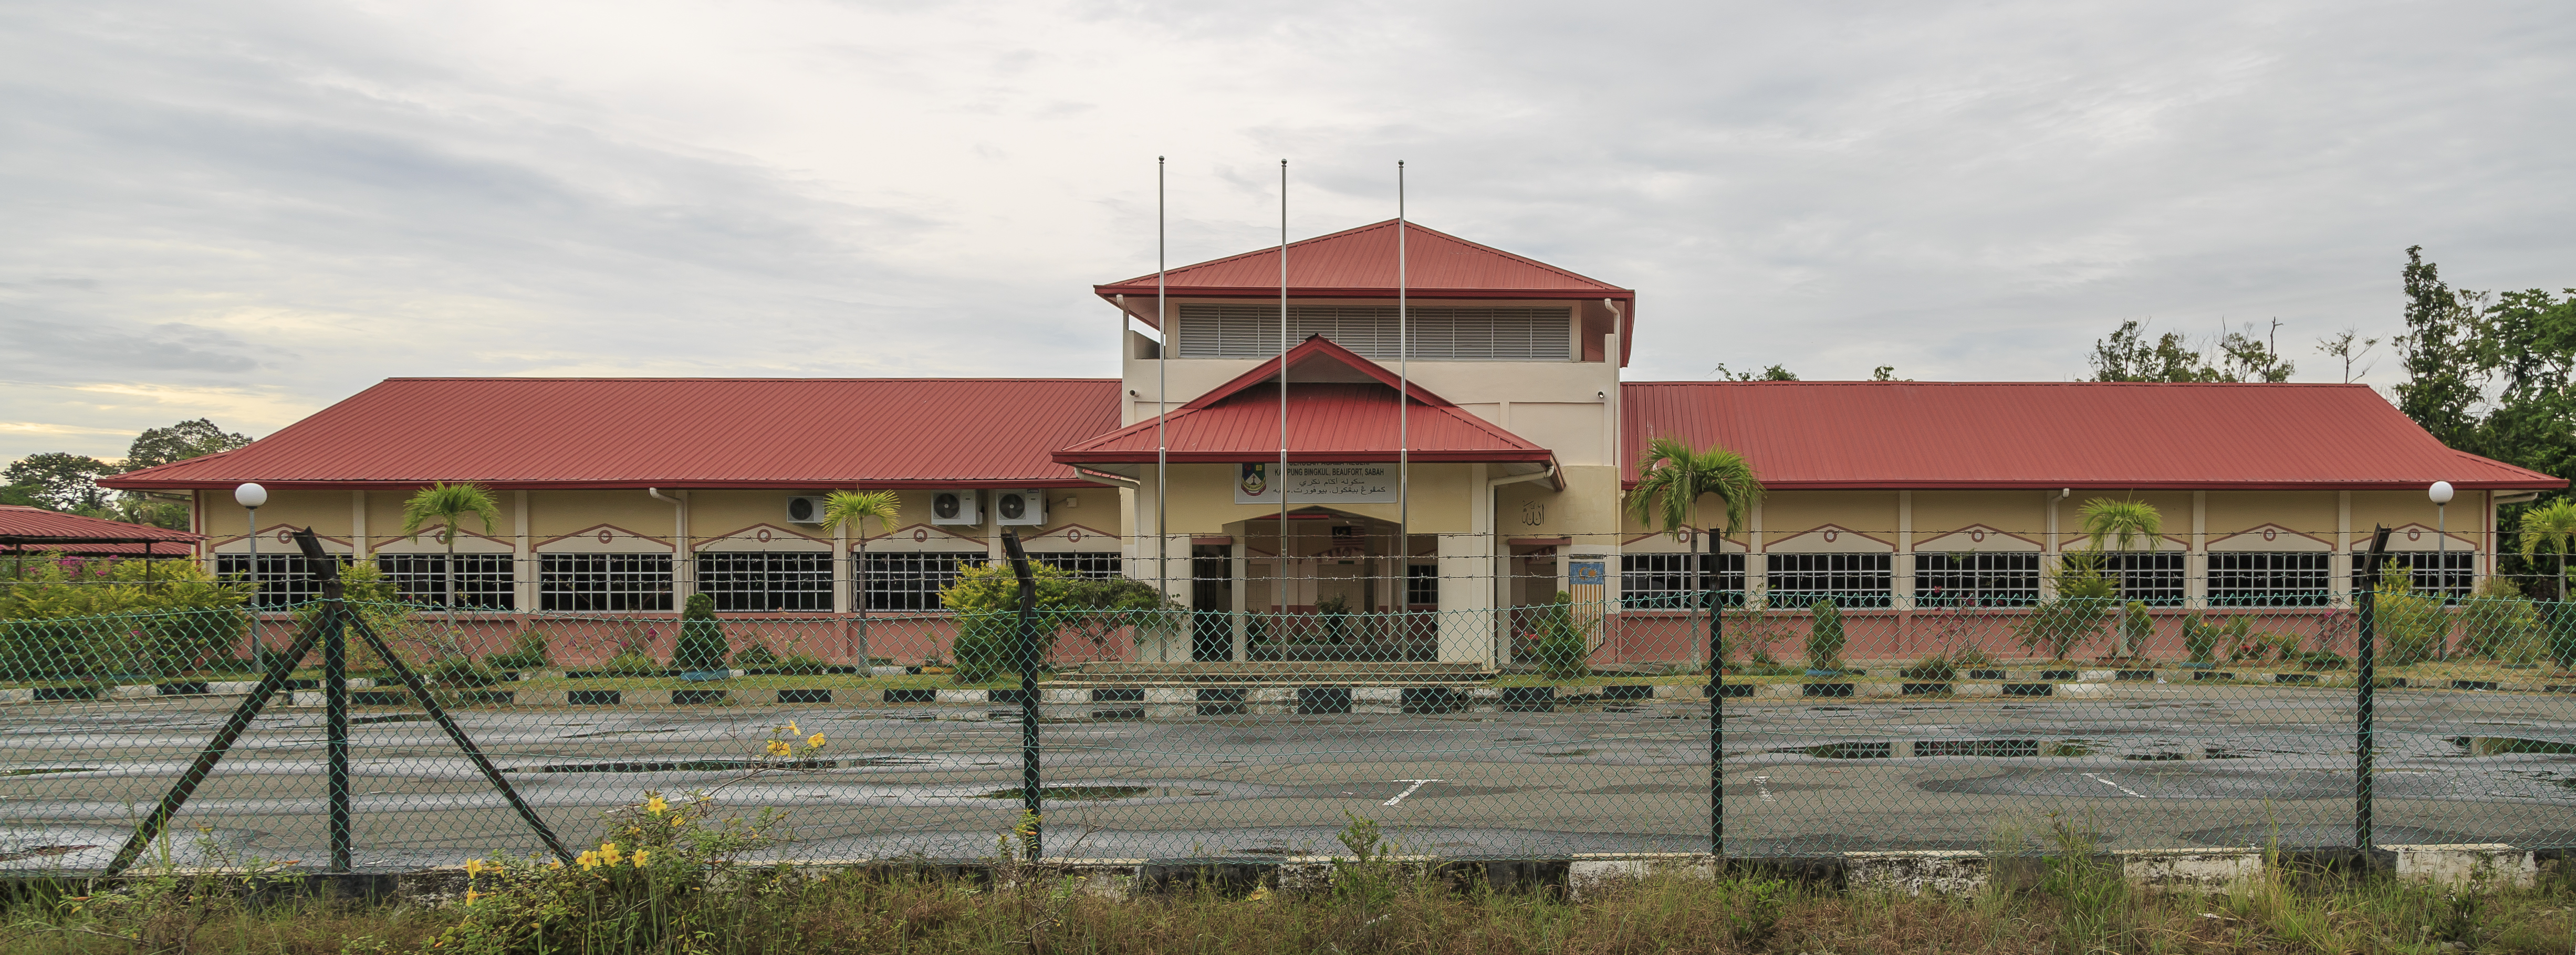 Beaufort Malaysia  city photos : Beaufort Sabah SAN Kg Bingkul 02 Wikimedia Commons